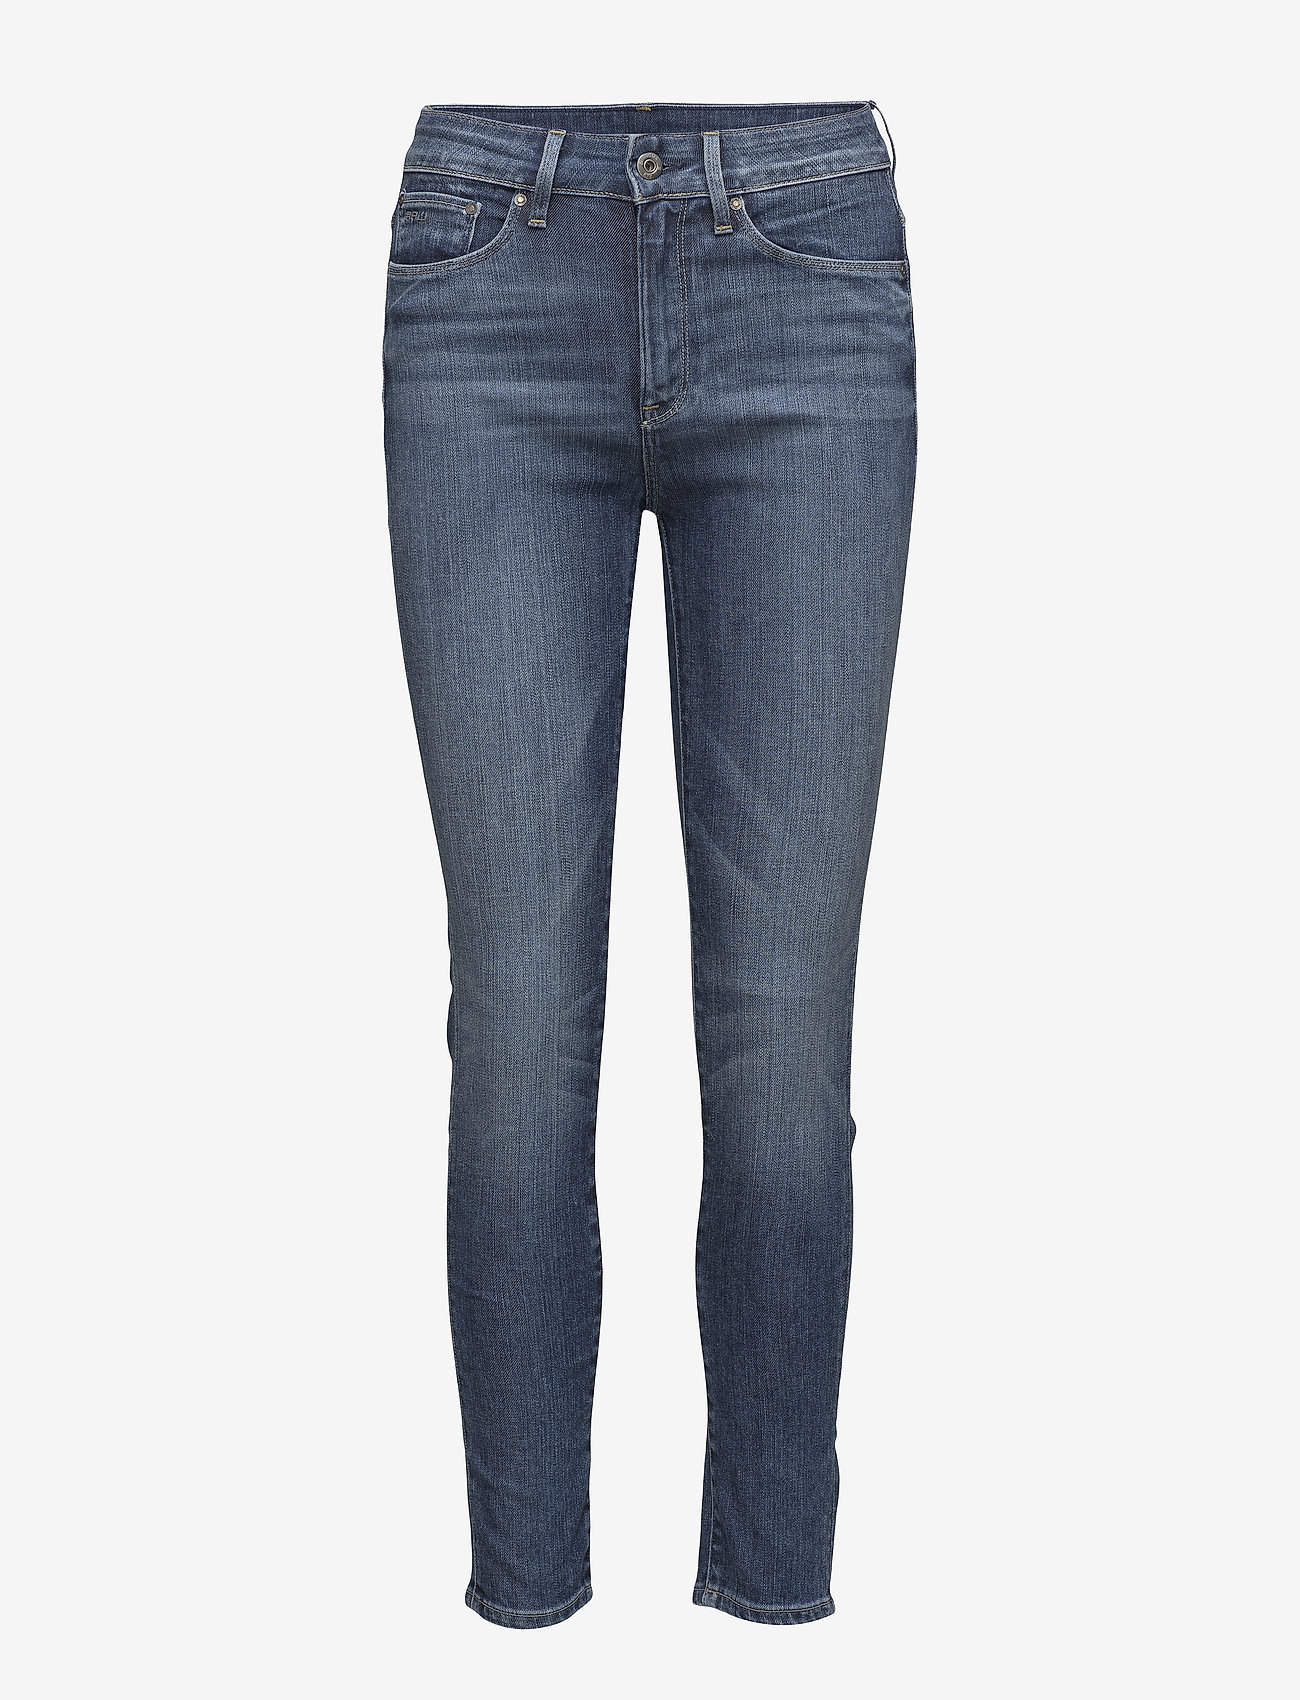 G-star RAW - 3301 ult hi sup - jeans skinny - dk aged - 0